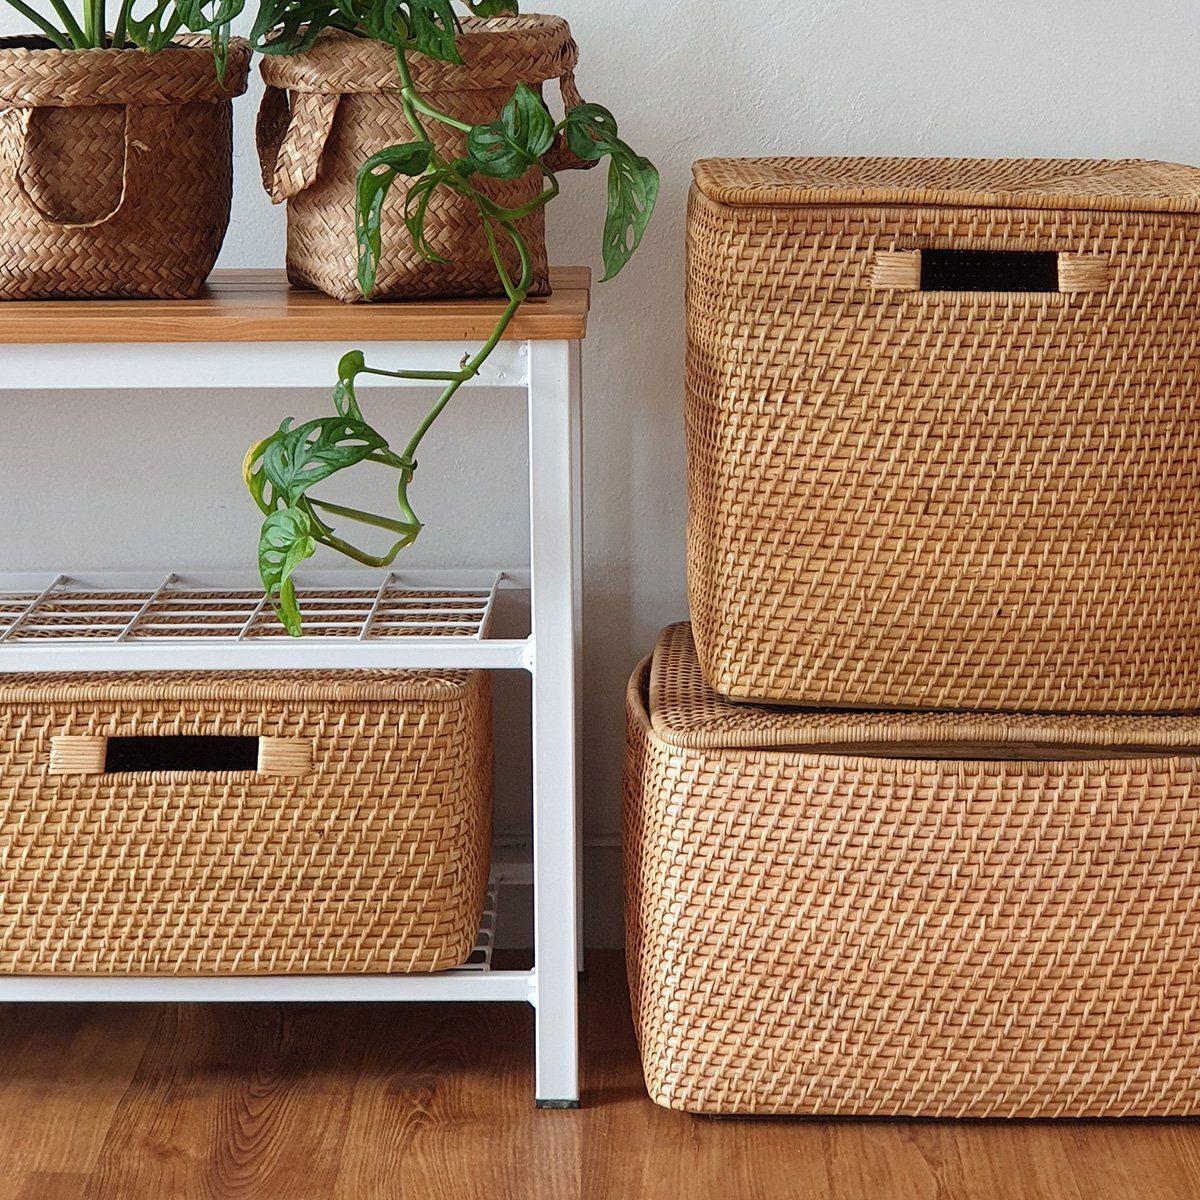 Basket bin overload